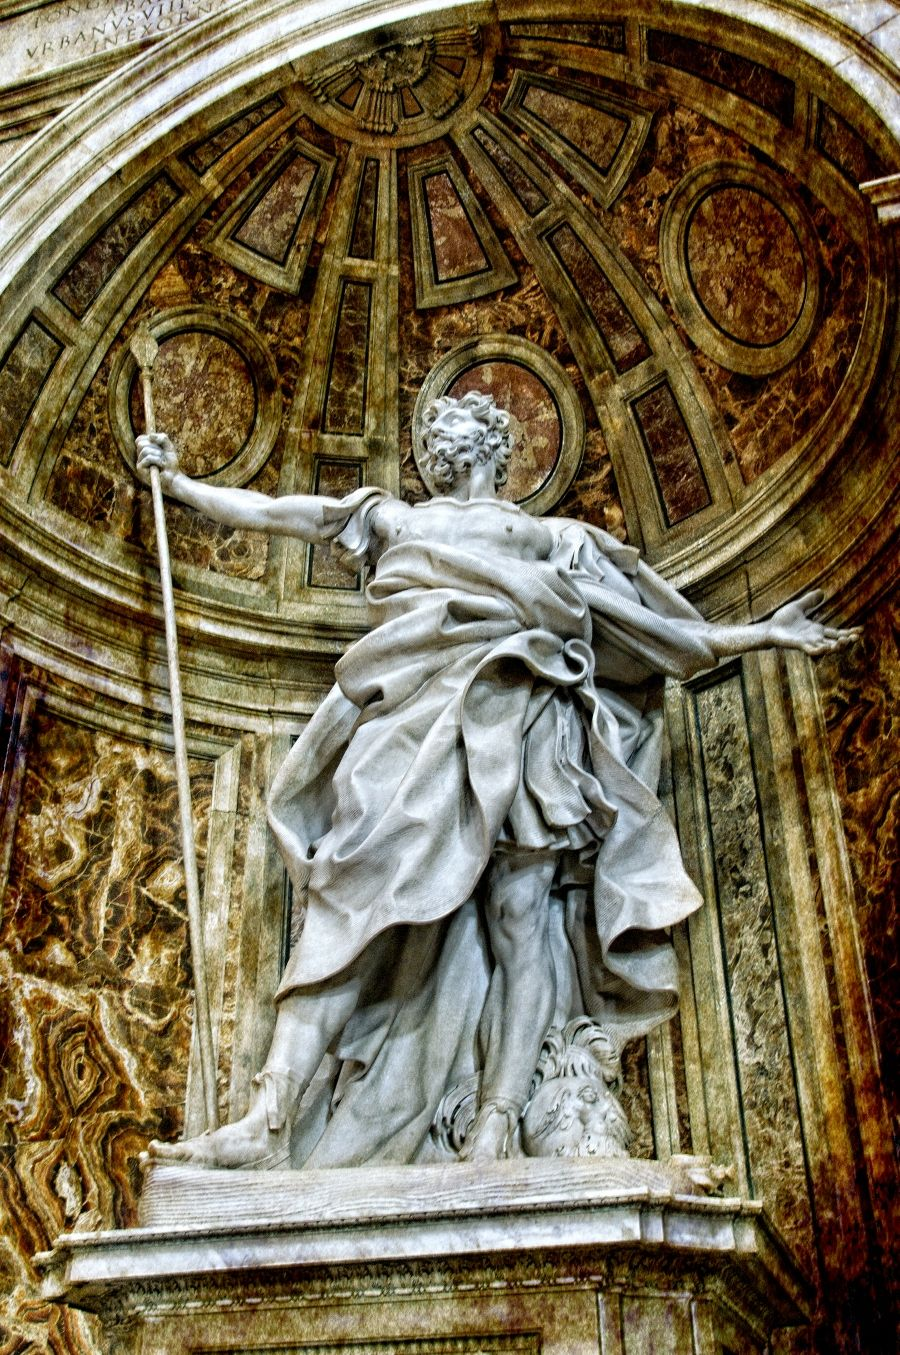 St. Peter's Basilica, Vatican. Impressive square, and